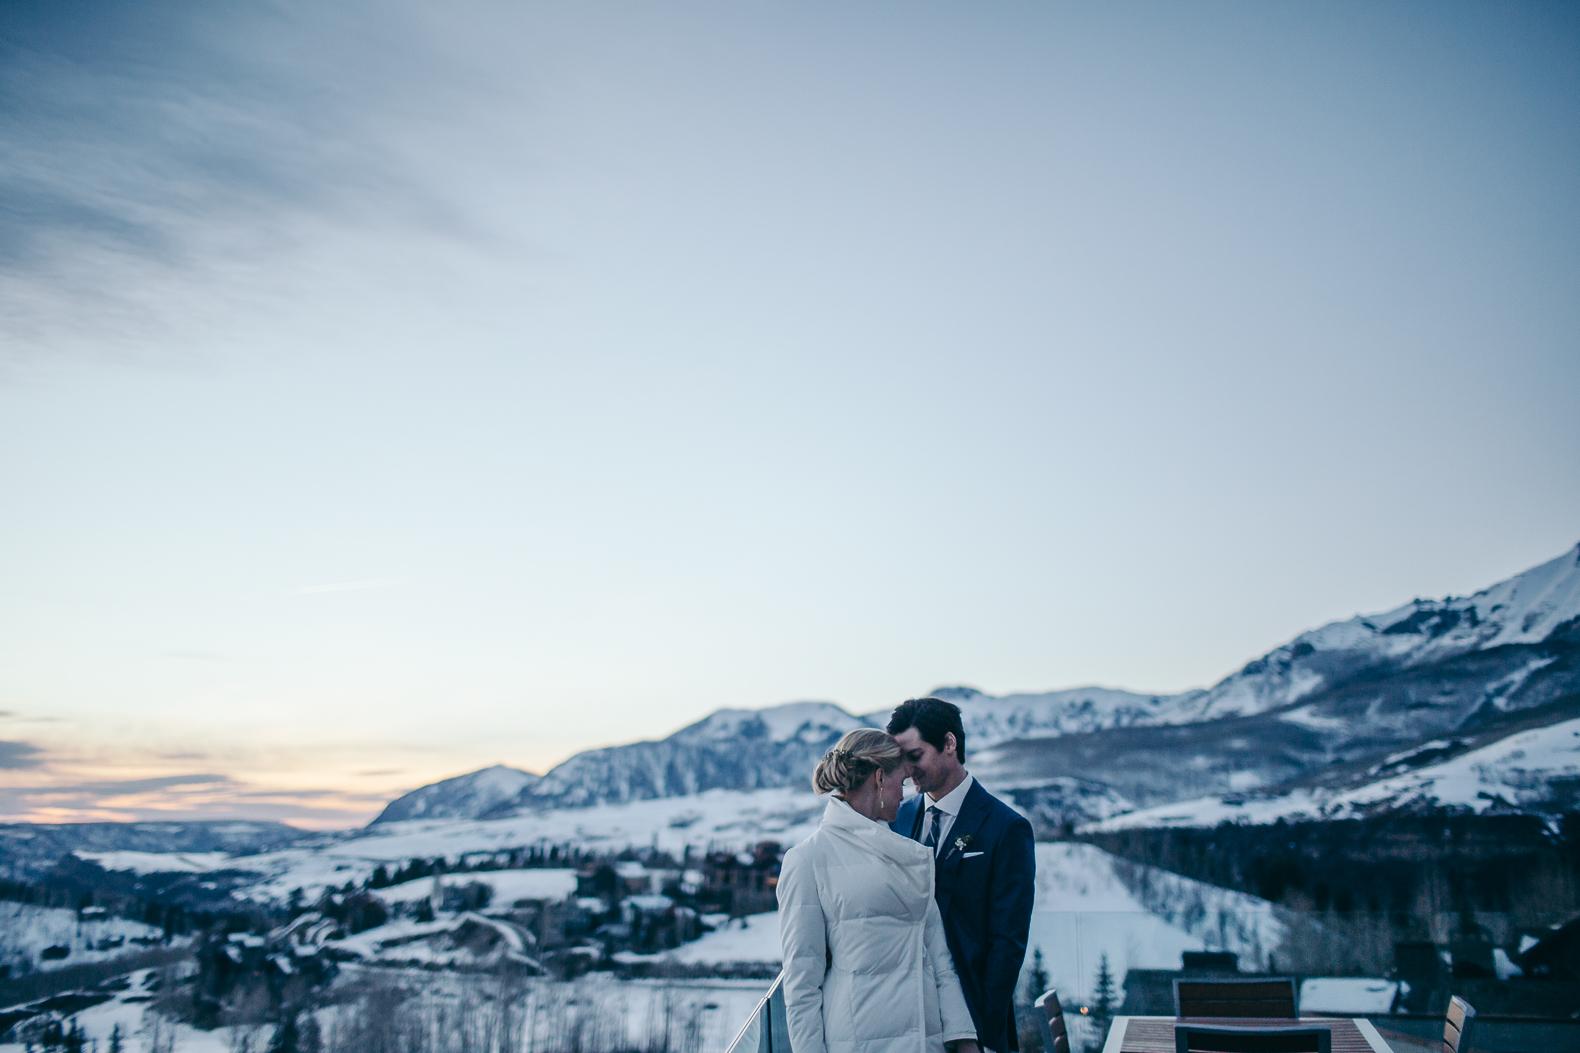 Abie Livesay Photography - San Sophia Wedding - Telluride Wedding Photographer - Dykema Braun Wedding-813.jpg